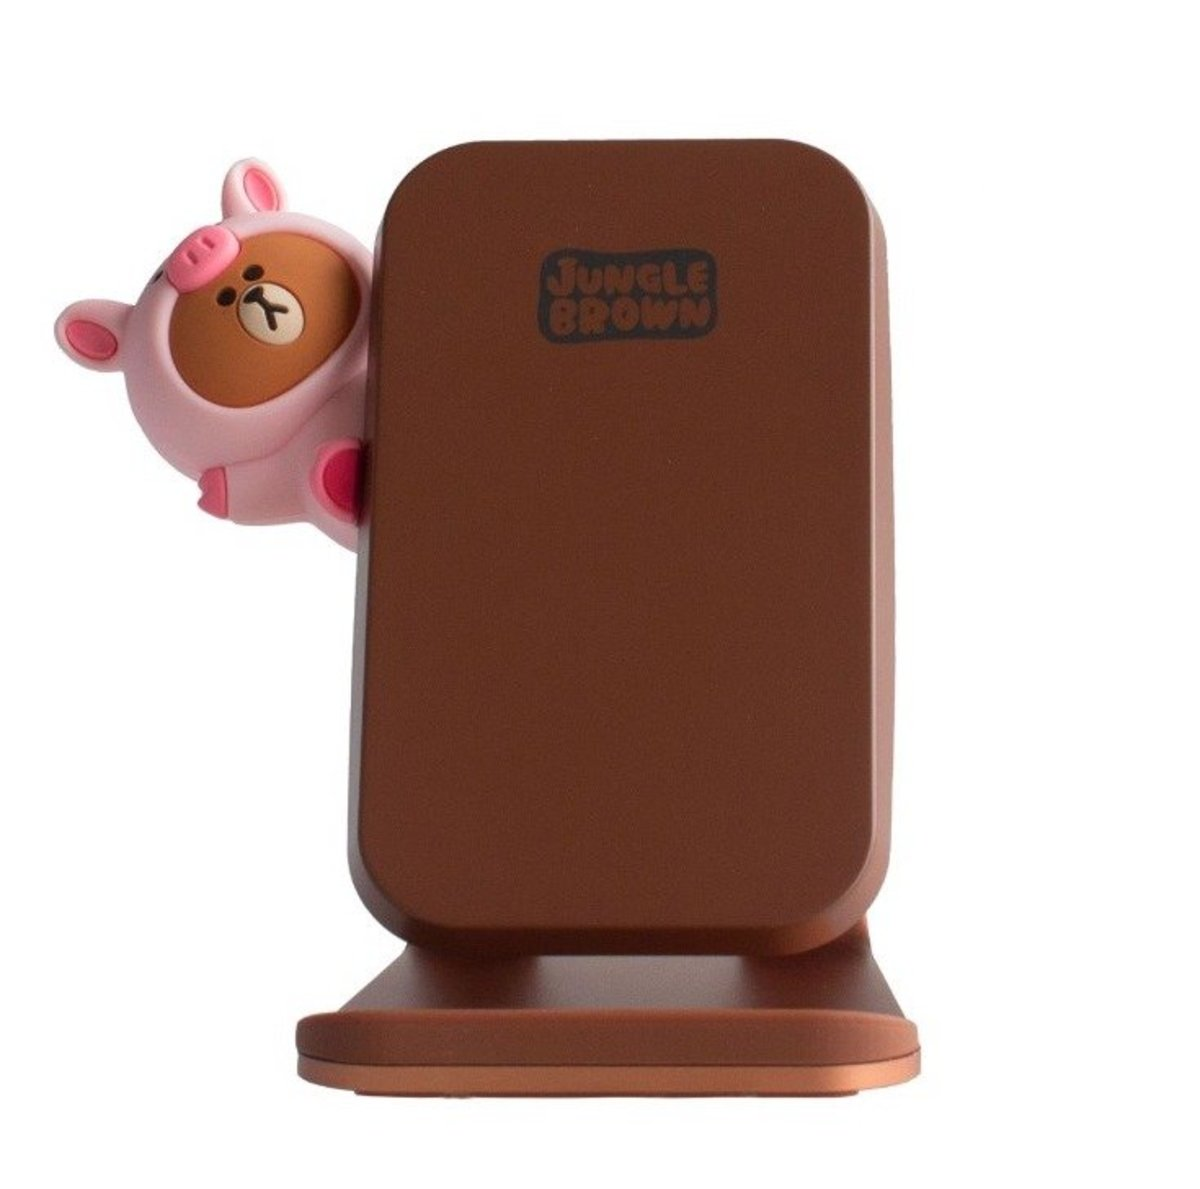 10W/7.5W Fast Wireless Charging Stand - Piggy Brown